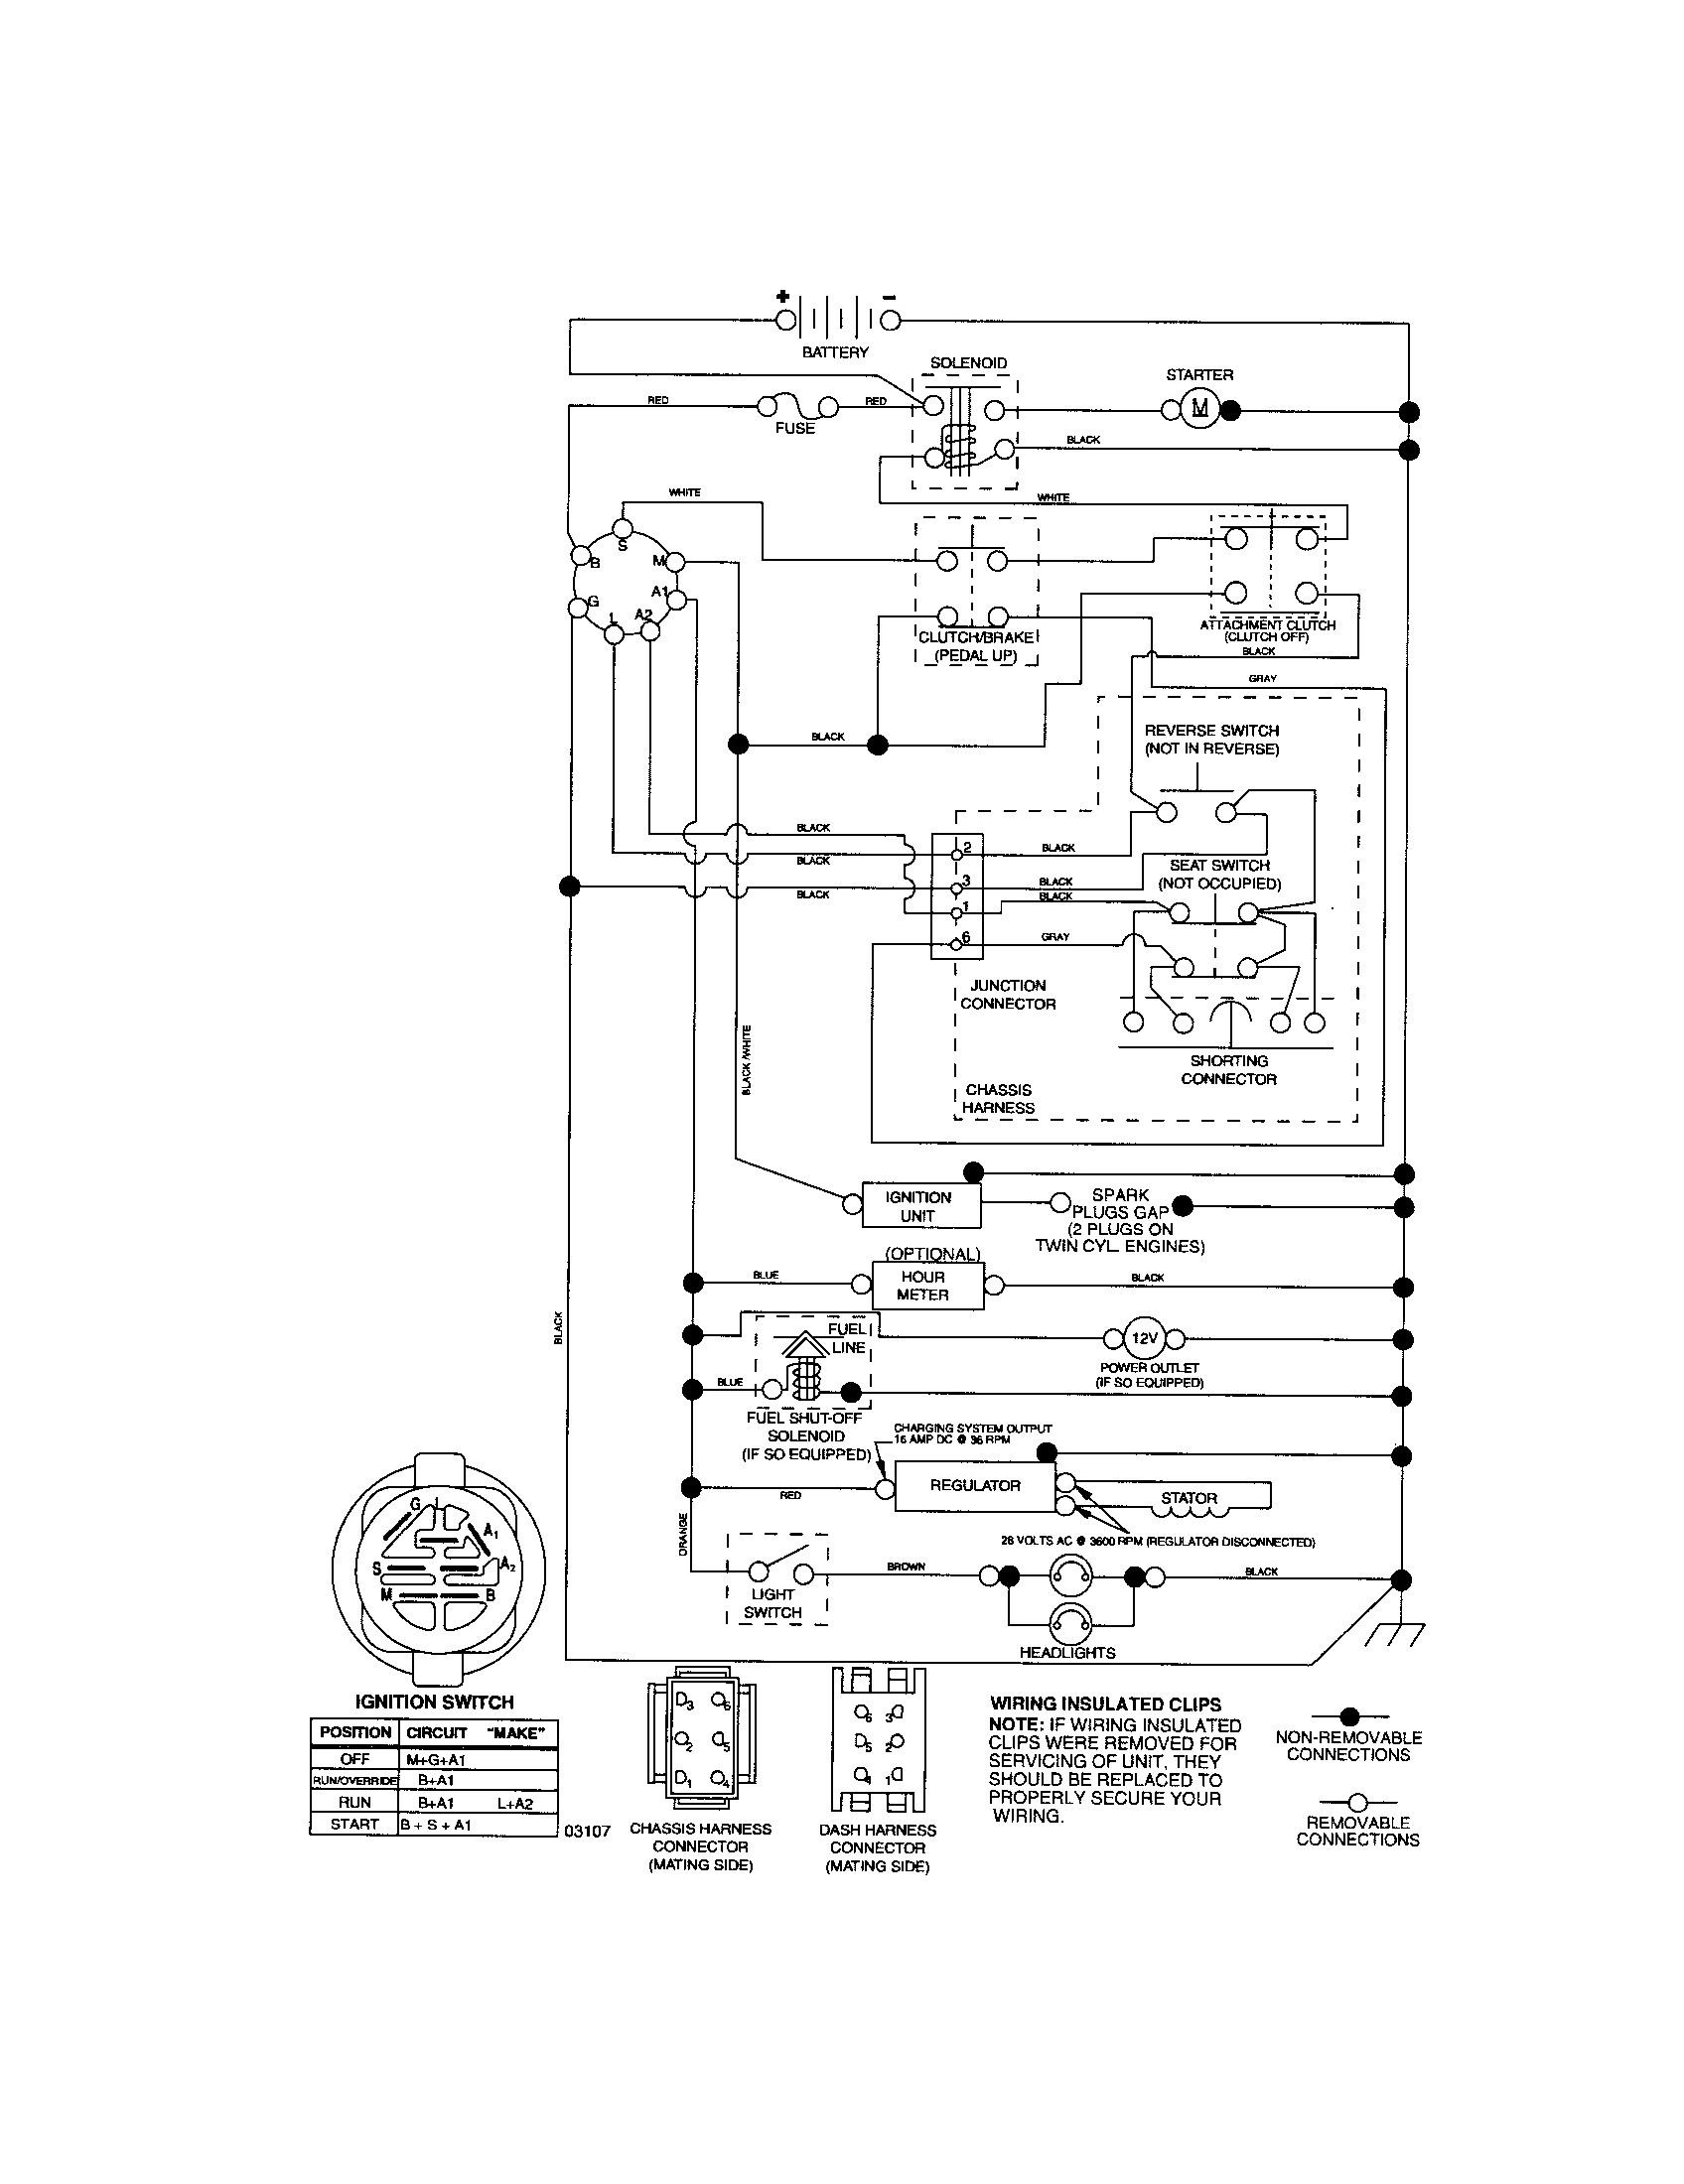 hight resolution of john deere l130 engine diagram craftsman riding mower electrical diagram of john deere l130 engine diagram